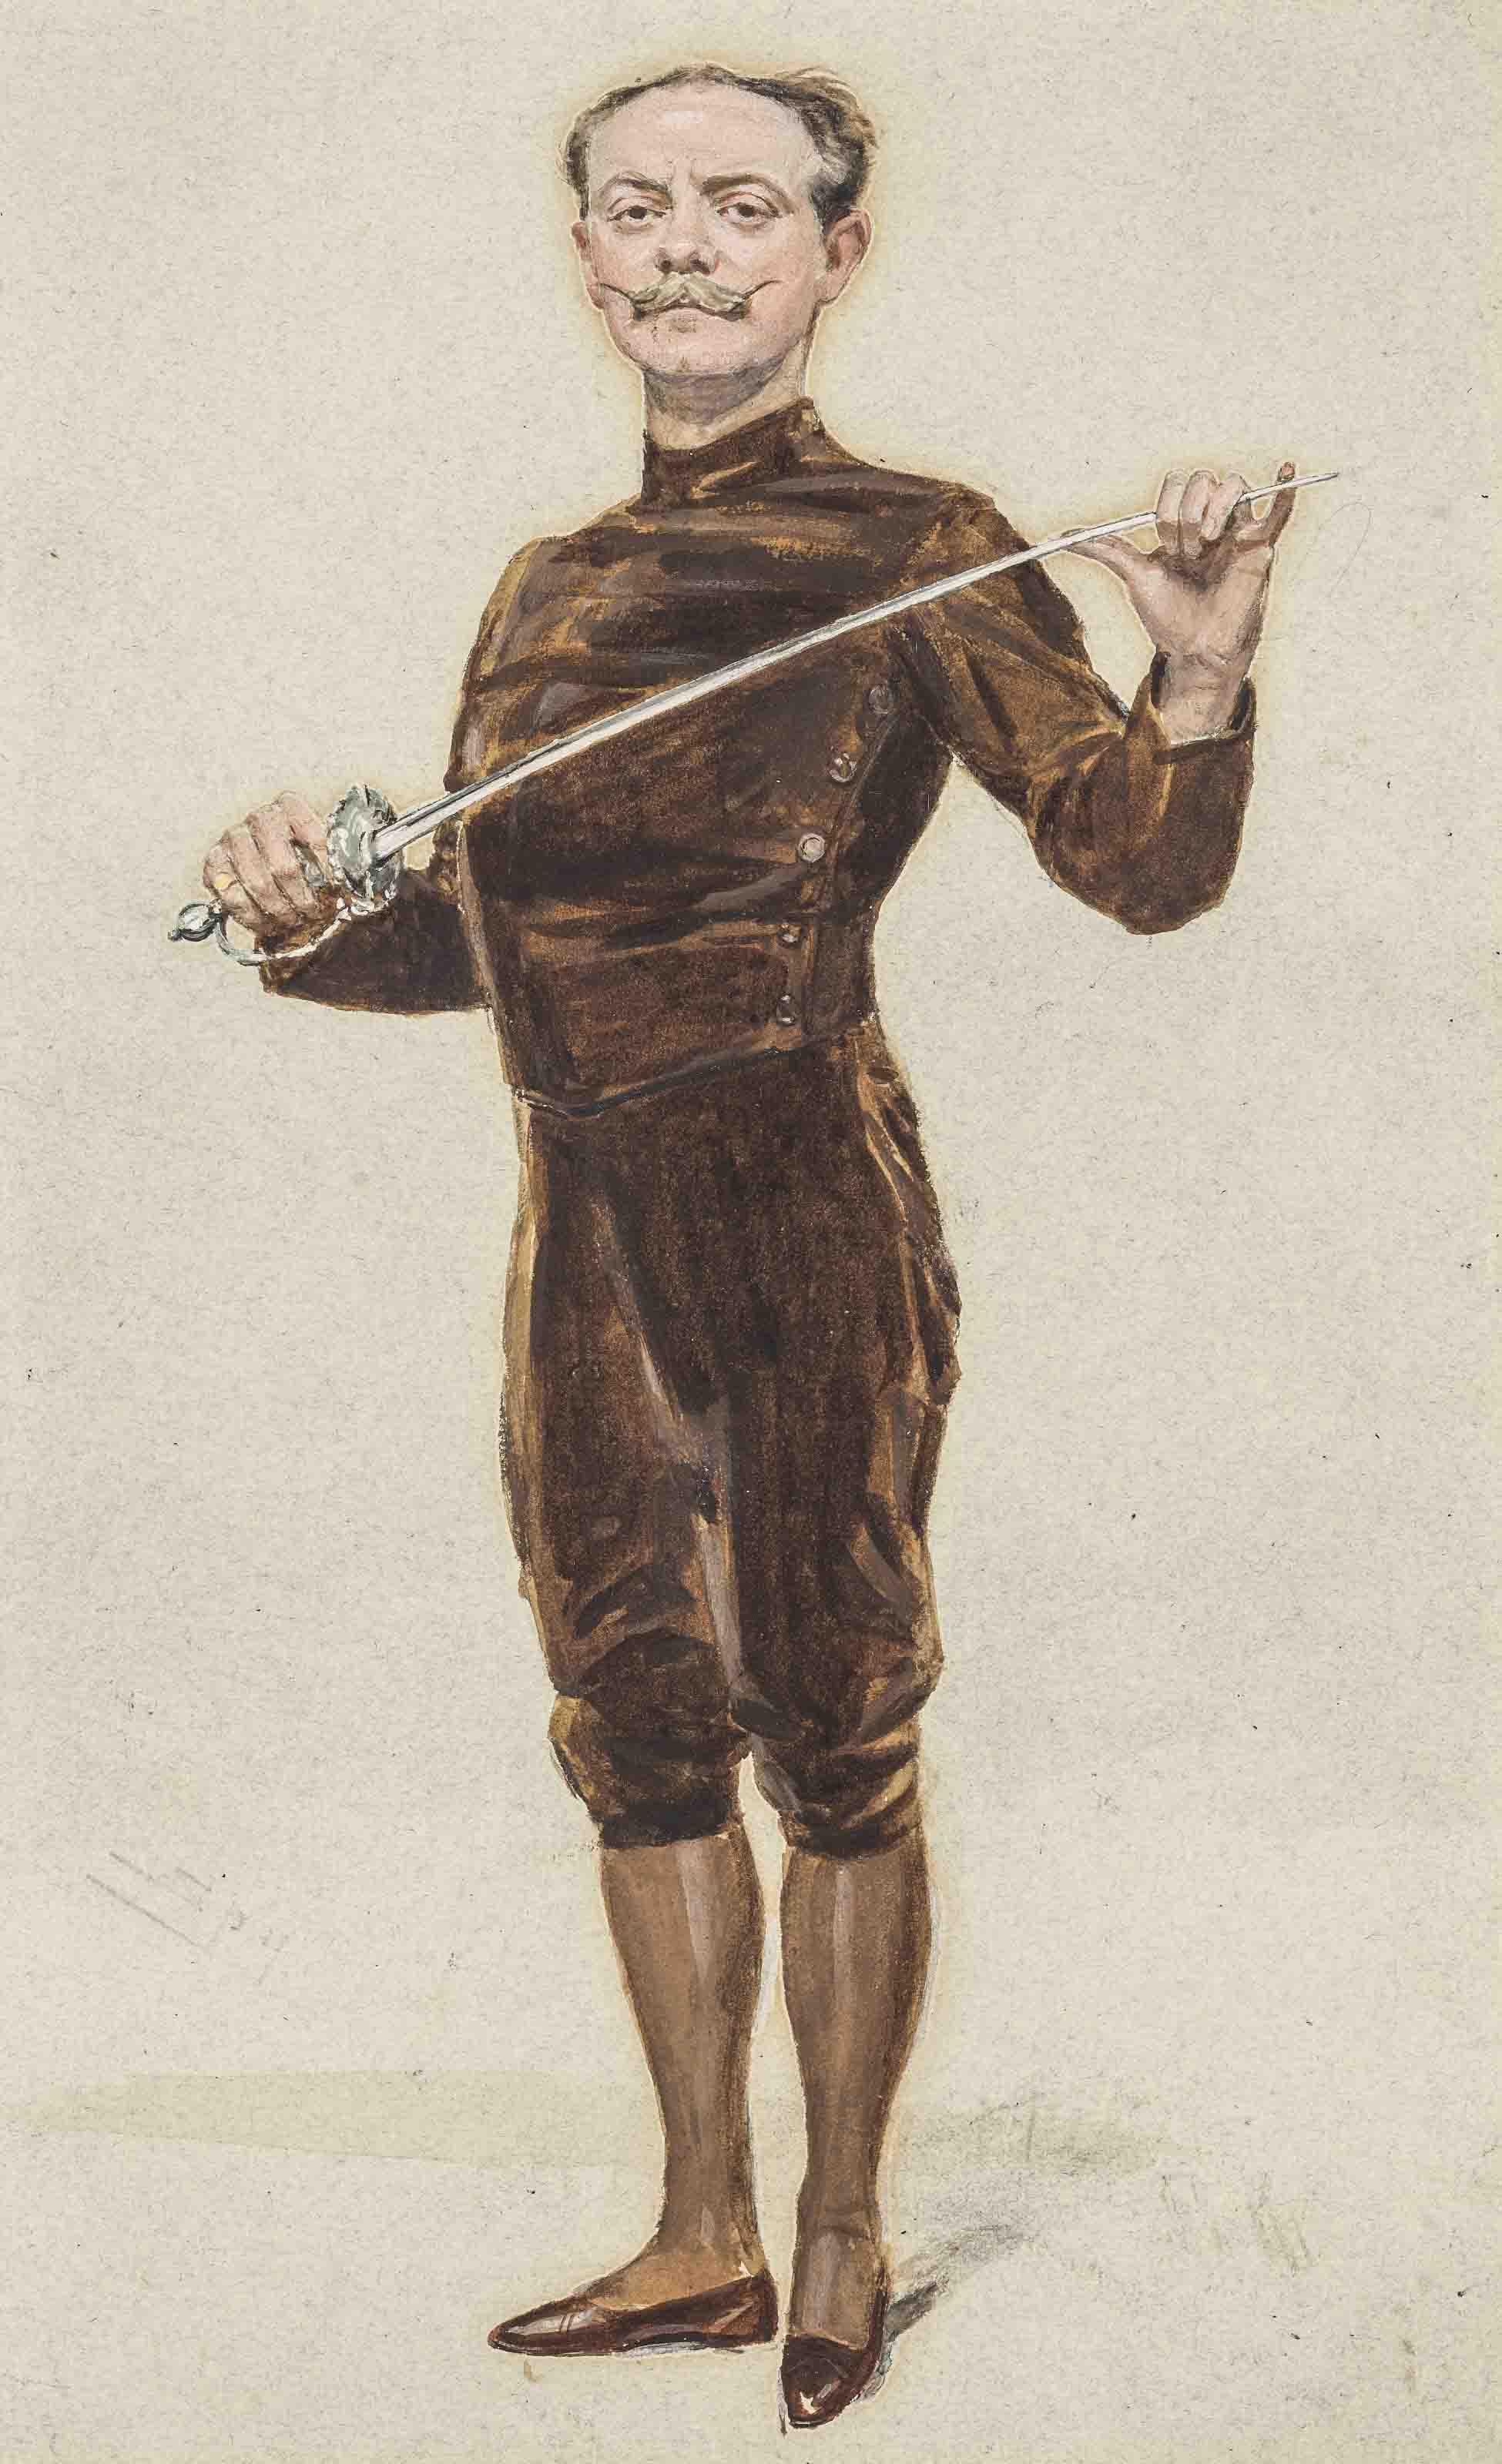 Portrait of Egerton Castle (1858-1920), standing, holding a fencing sword